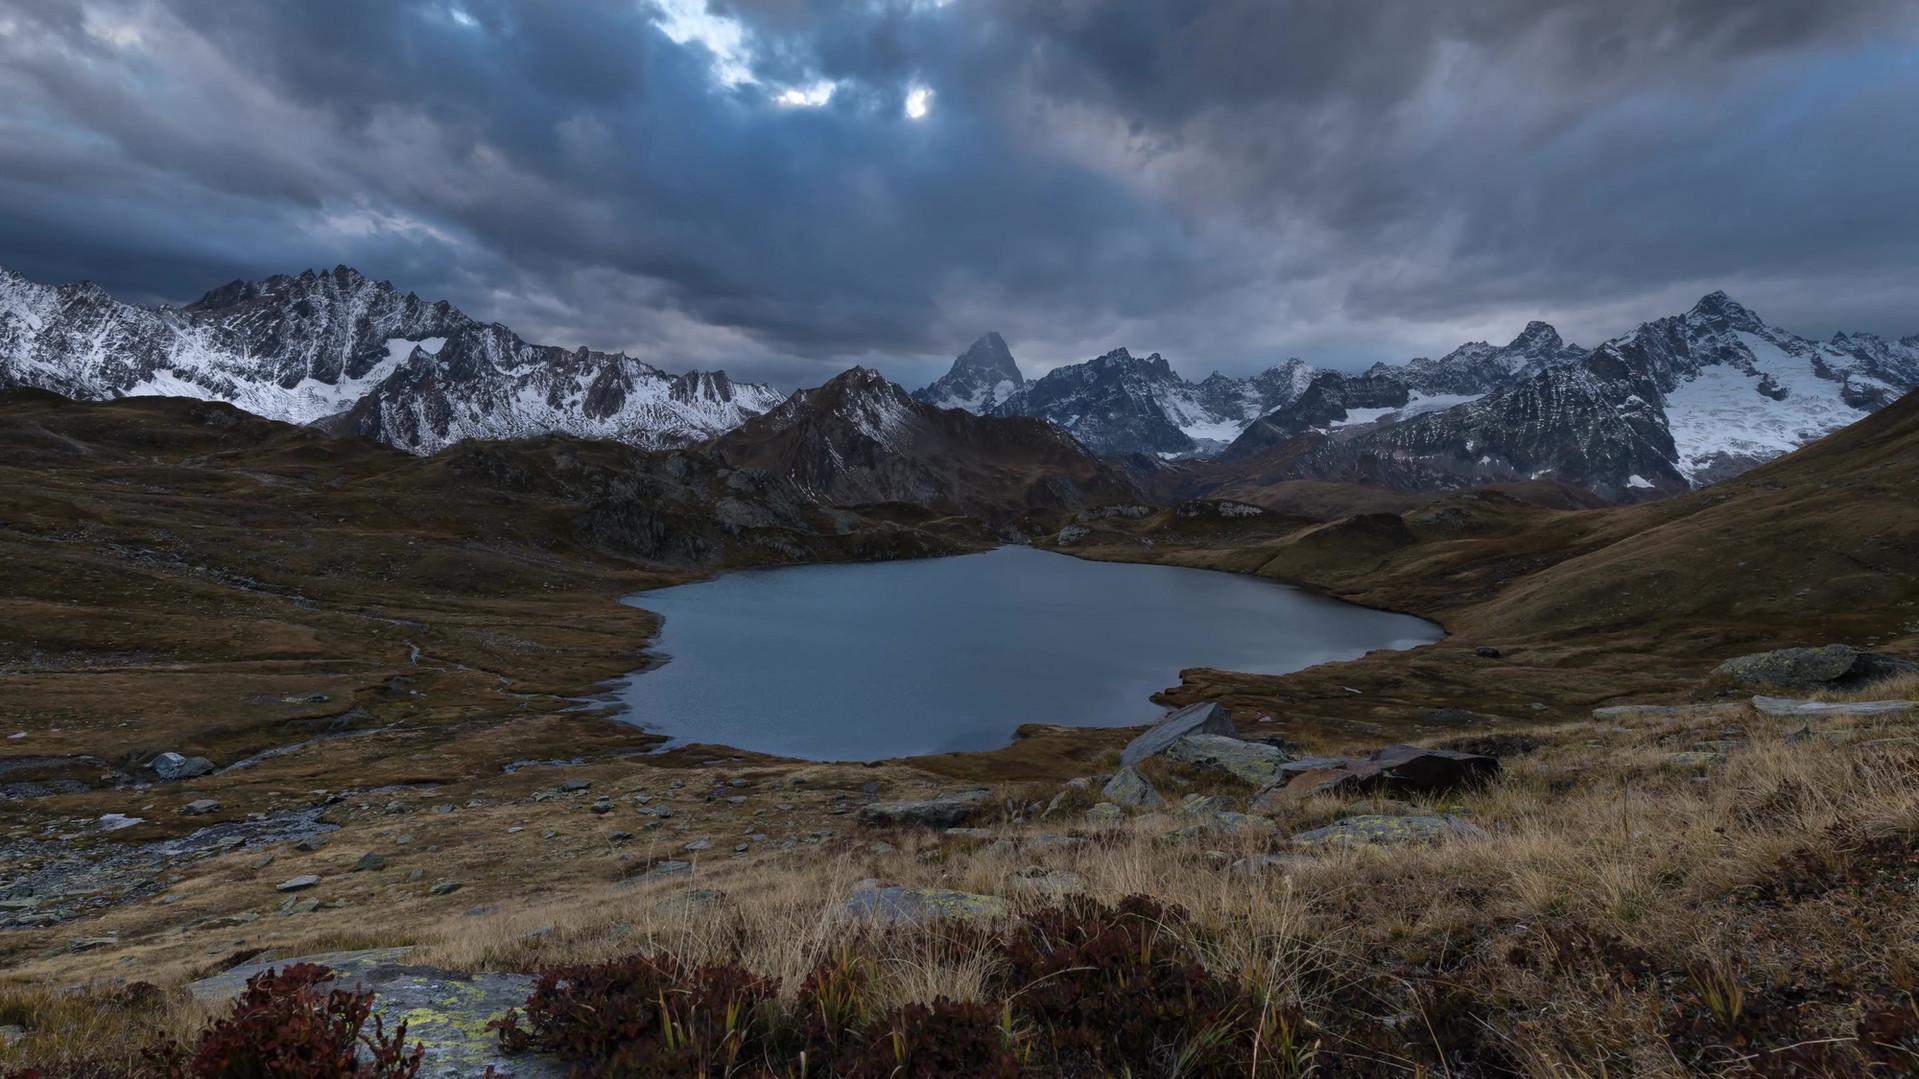 Time lapse nuvole 4 laghi fenetre.mp4